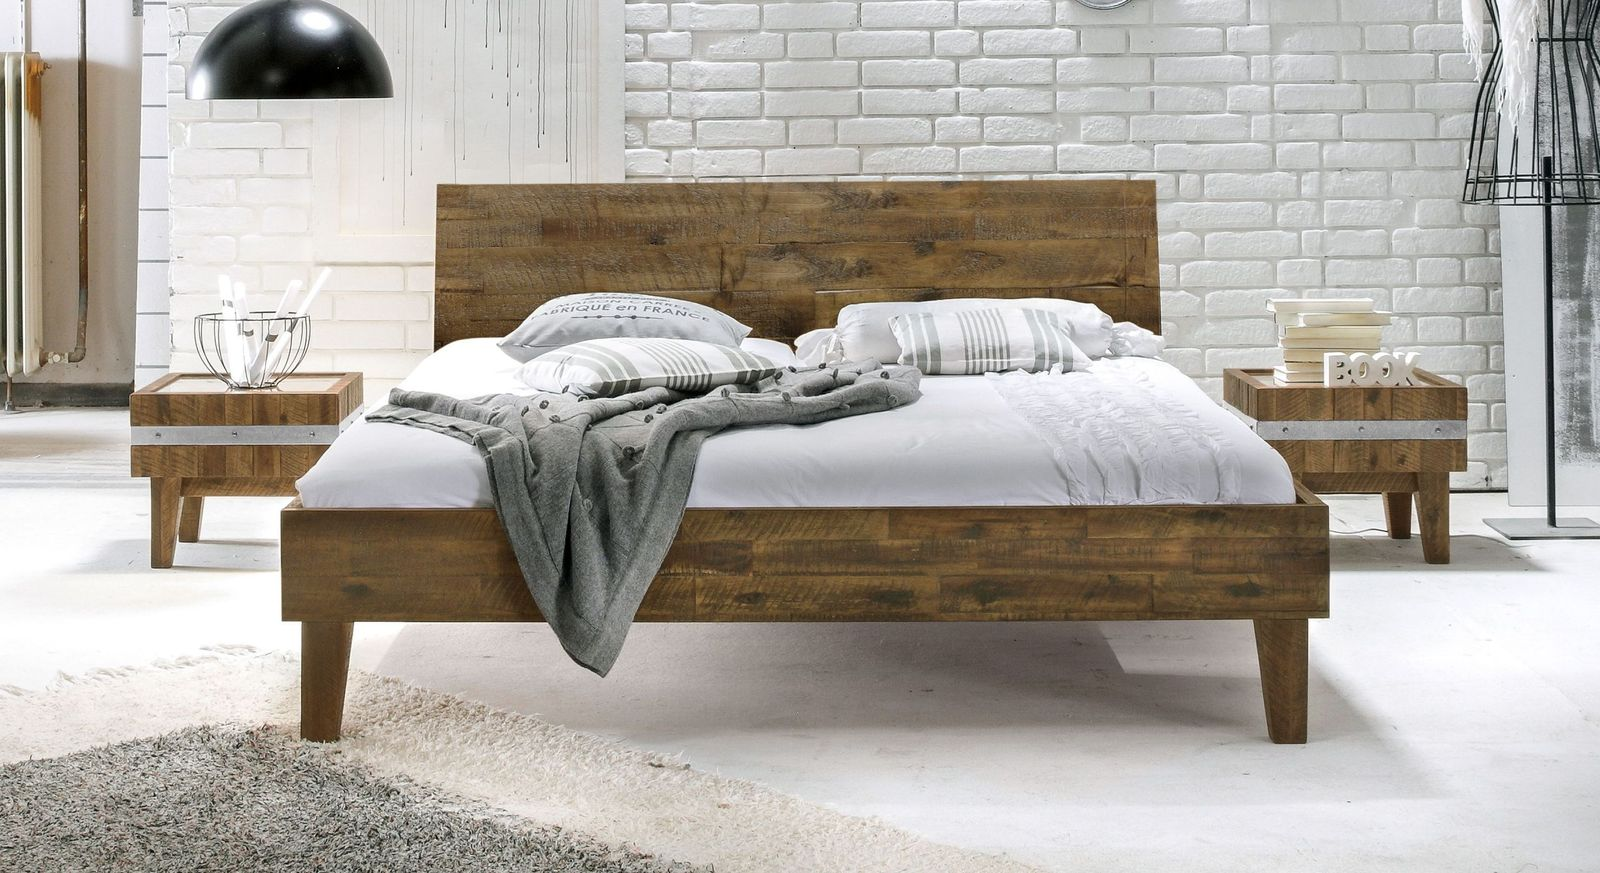 Bett Paraiso in elegantem Design